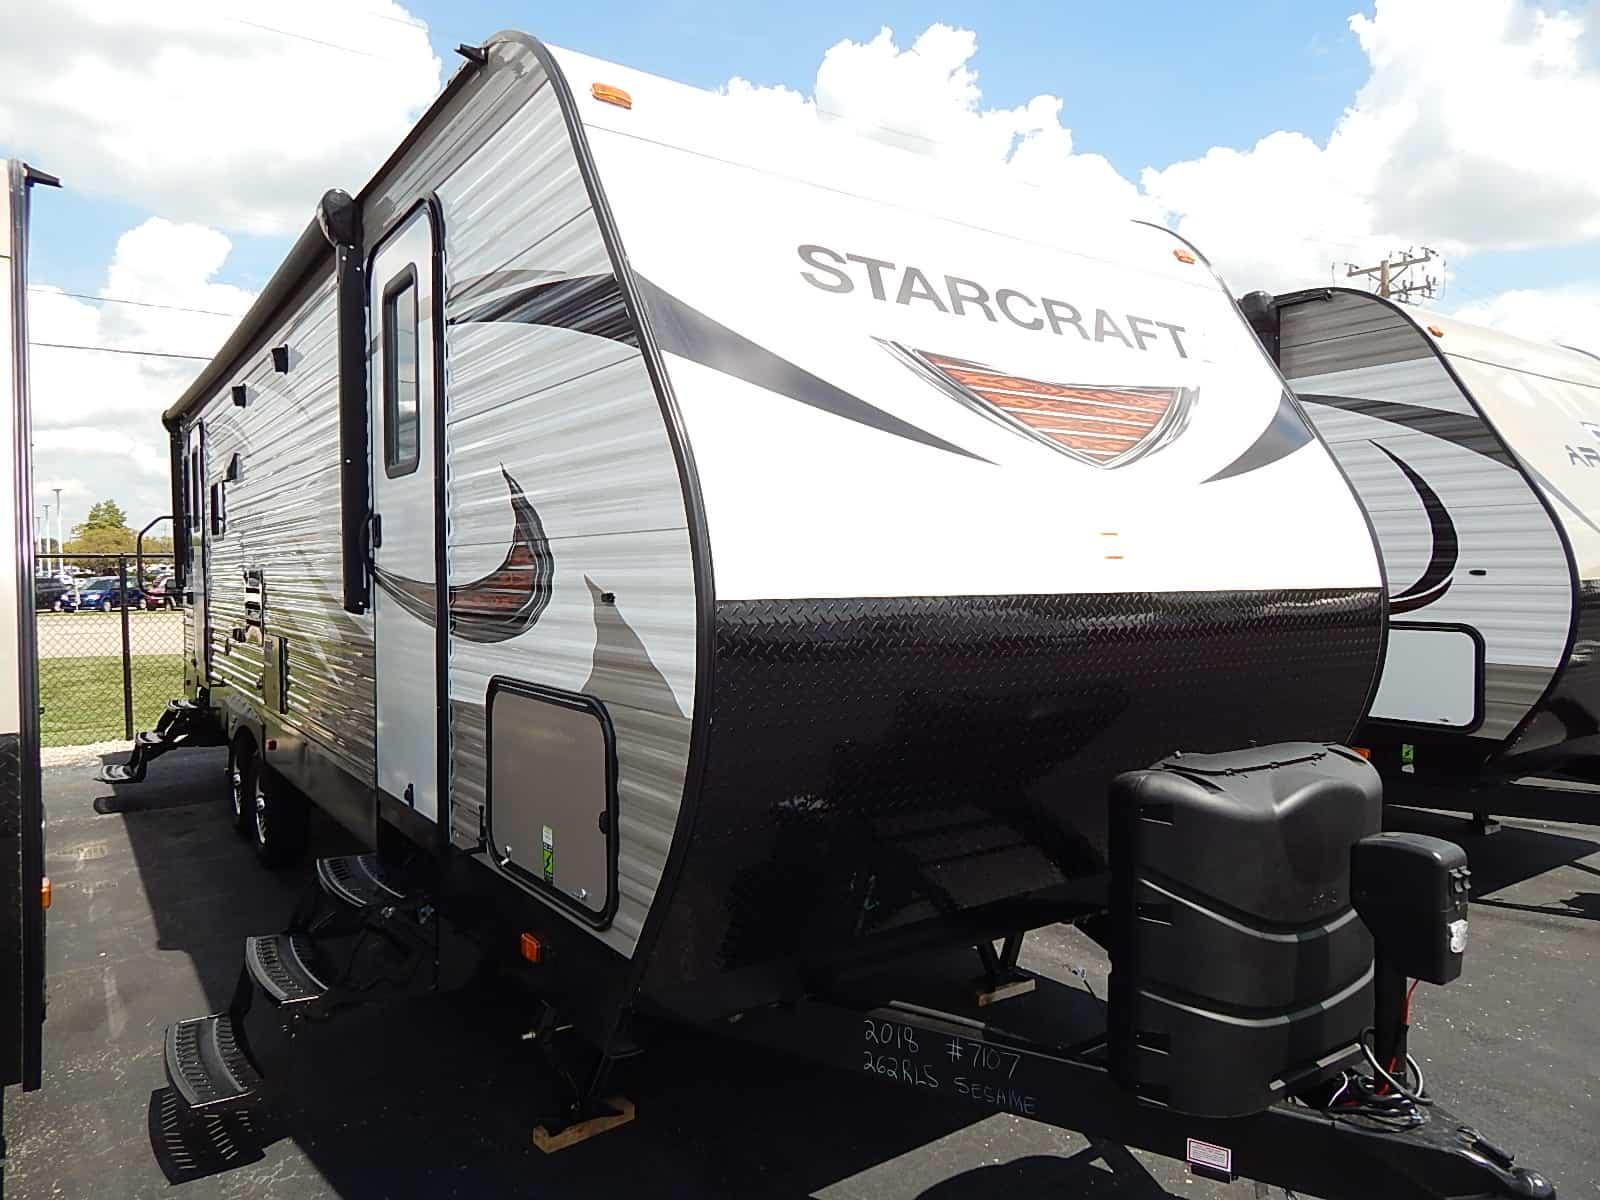 Starcraft Rvs For Sale Chicago